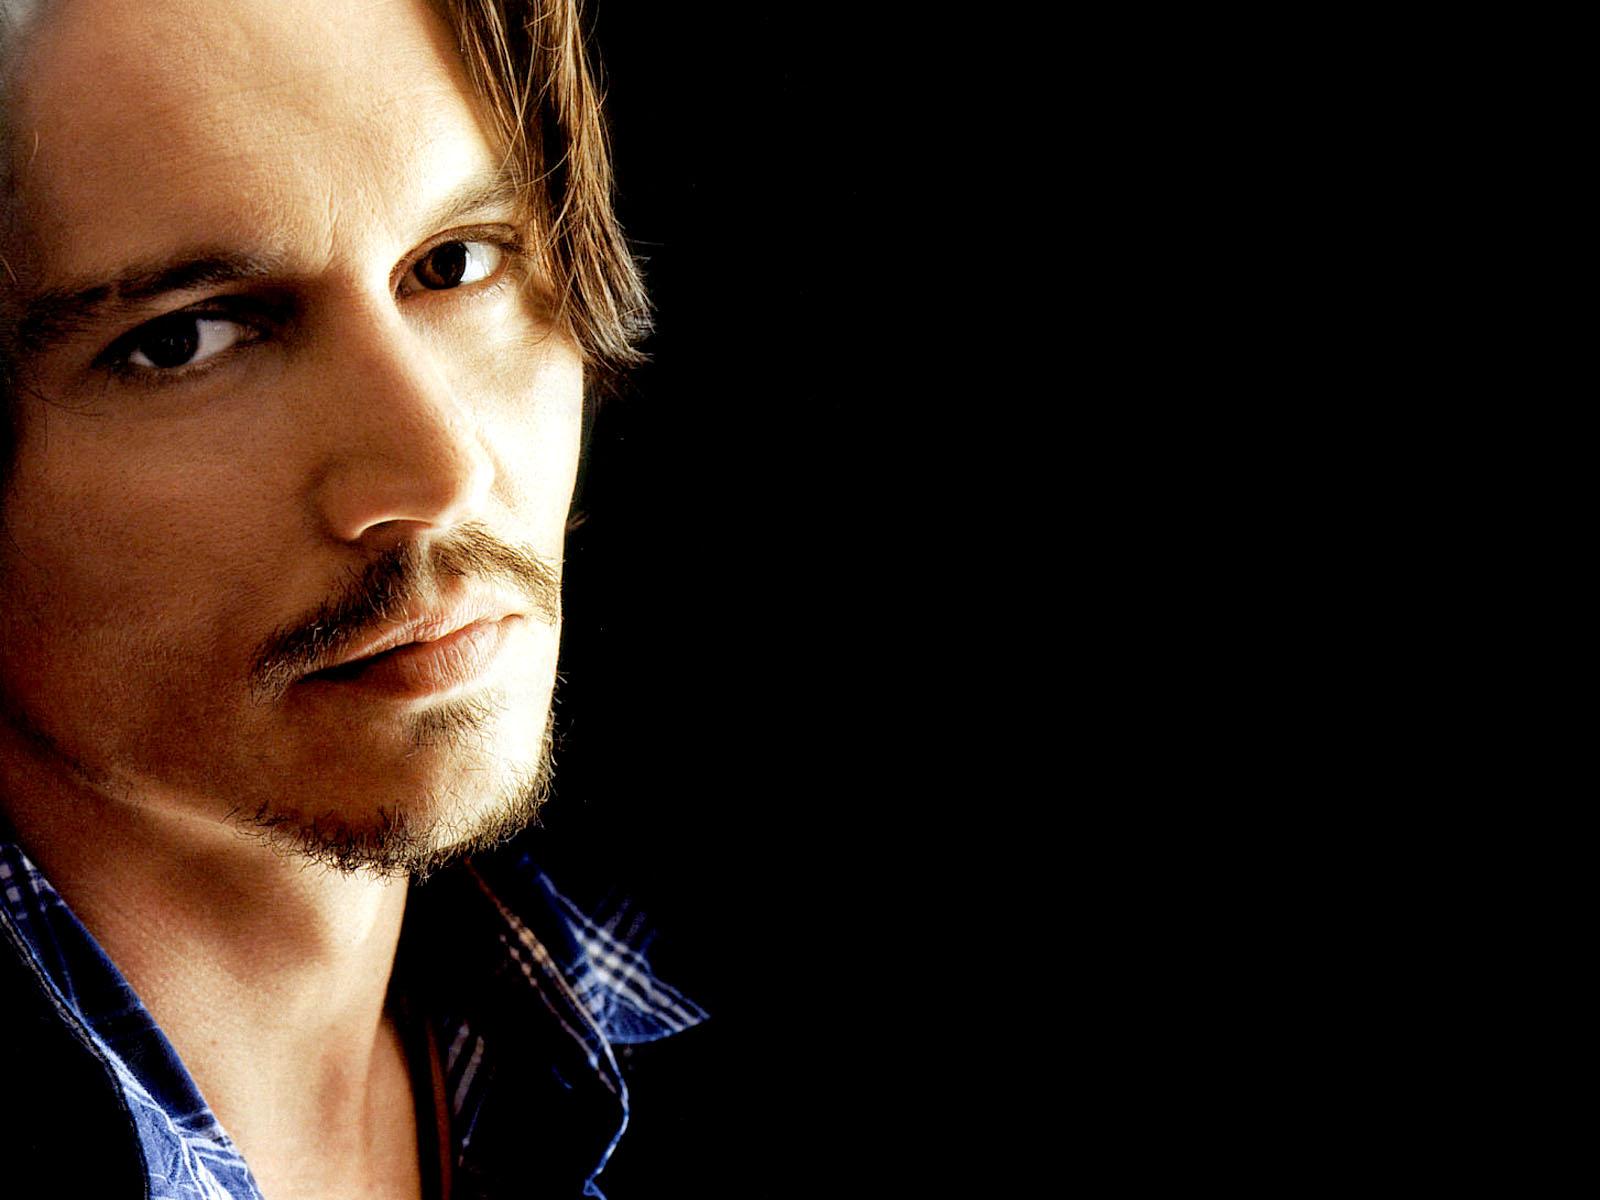 Johnny Depp 2 Background